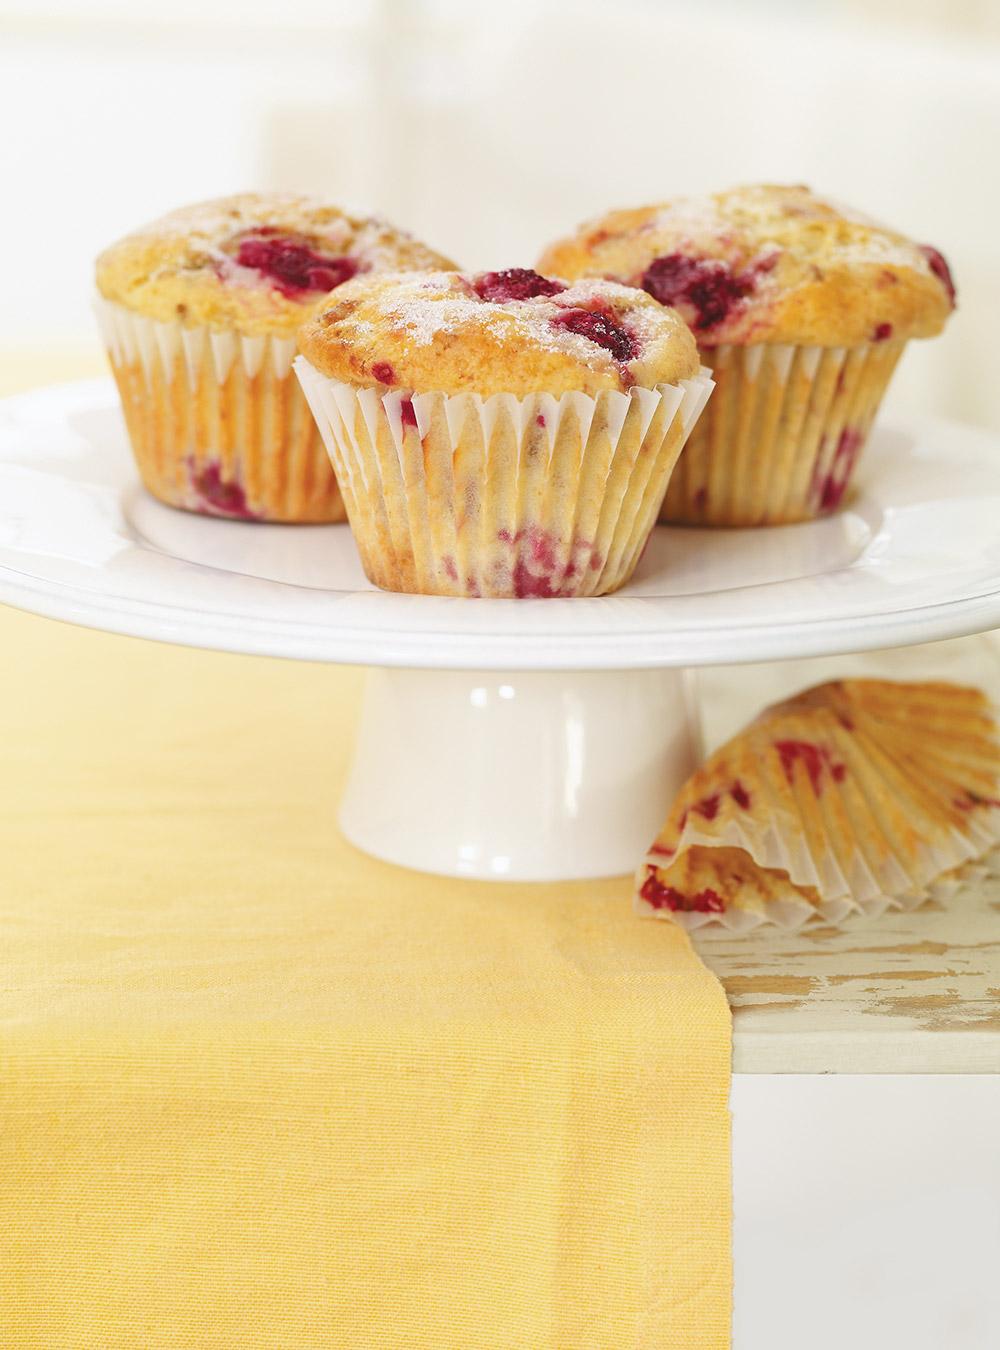 Muffins aux framboises et au kéfir | ricardo